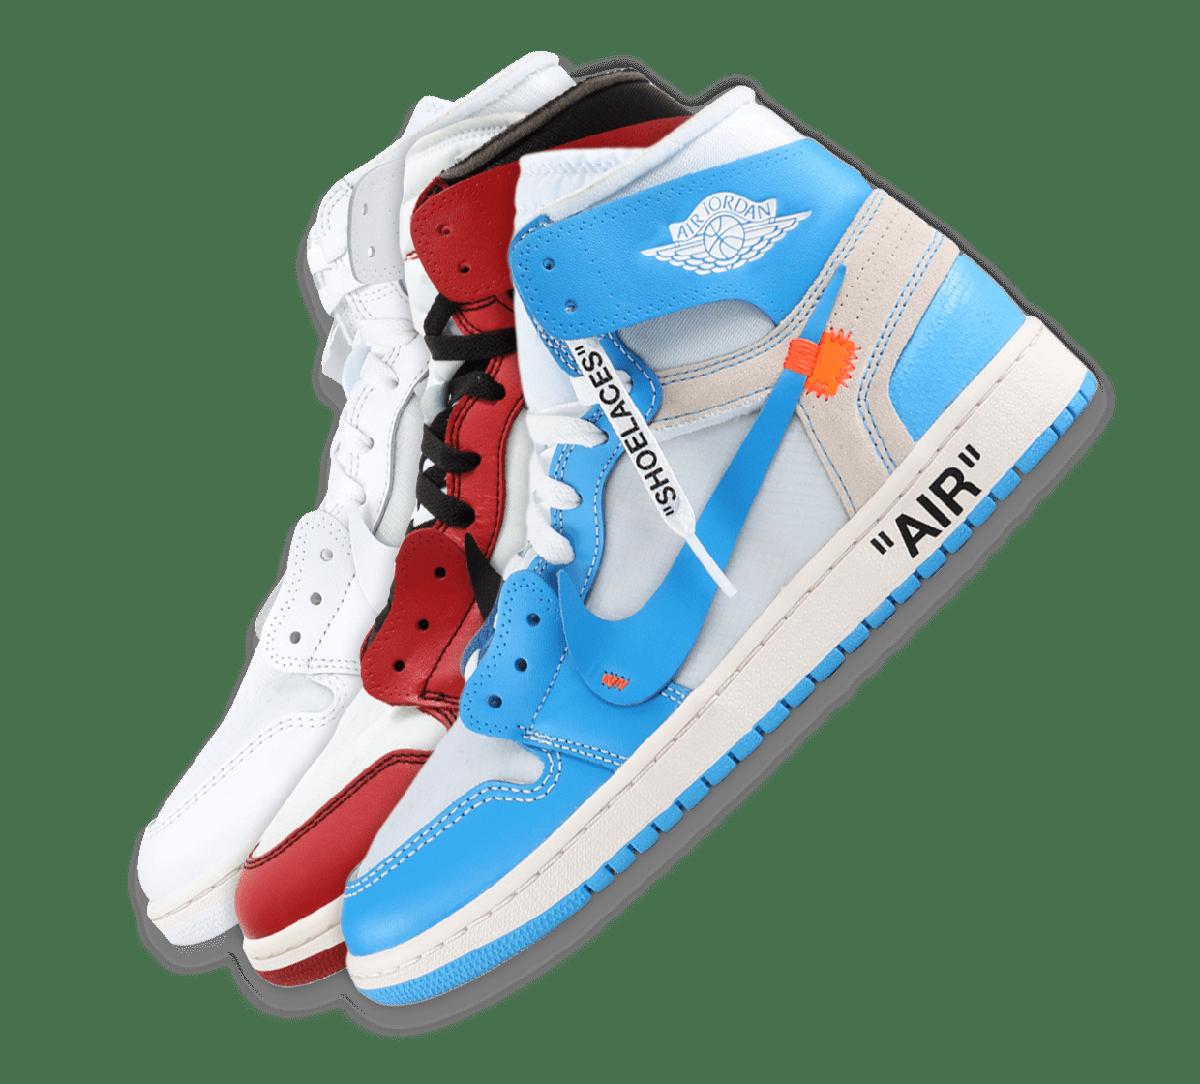 Nike x Off-White Jordan 1 Collection Image